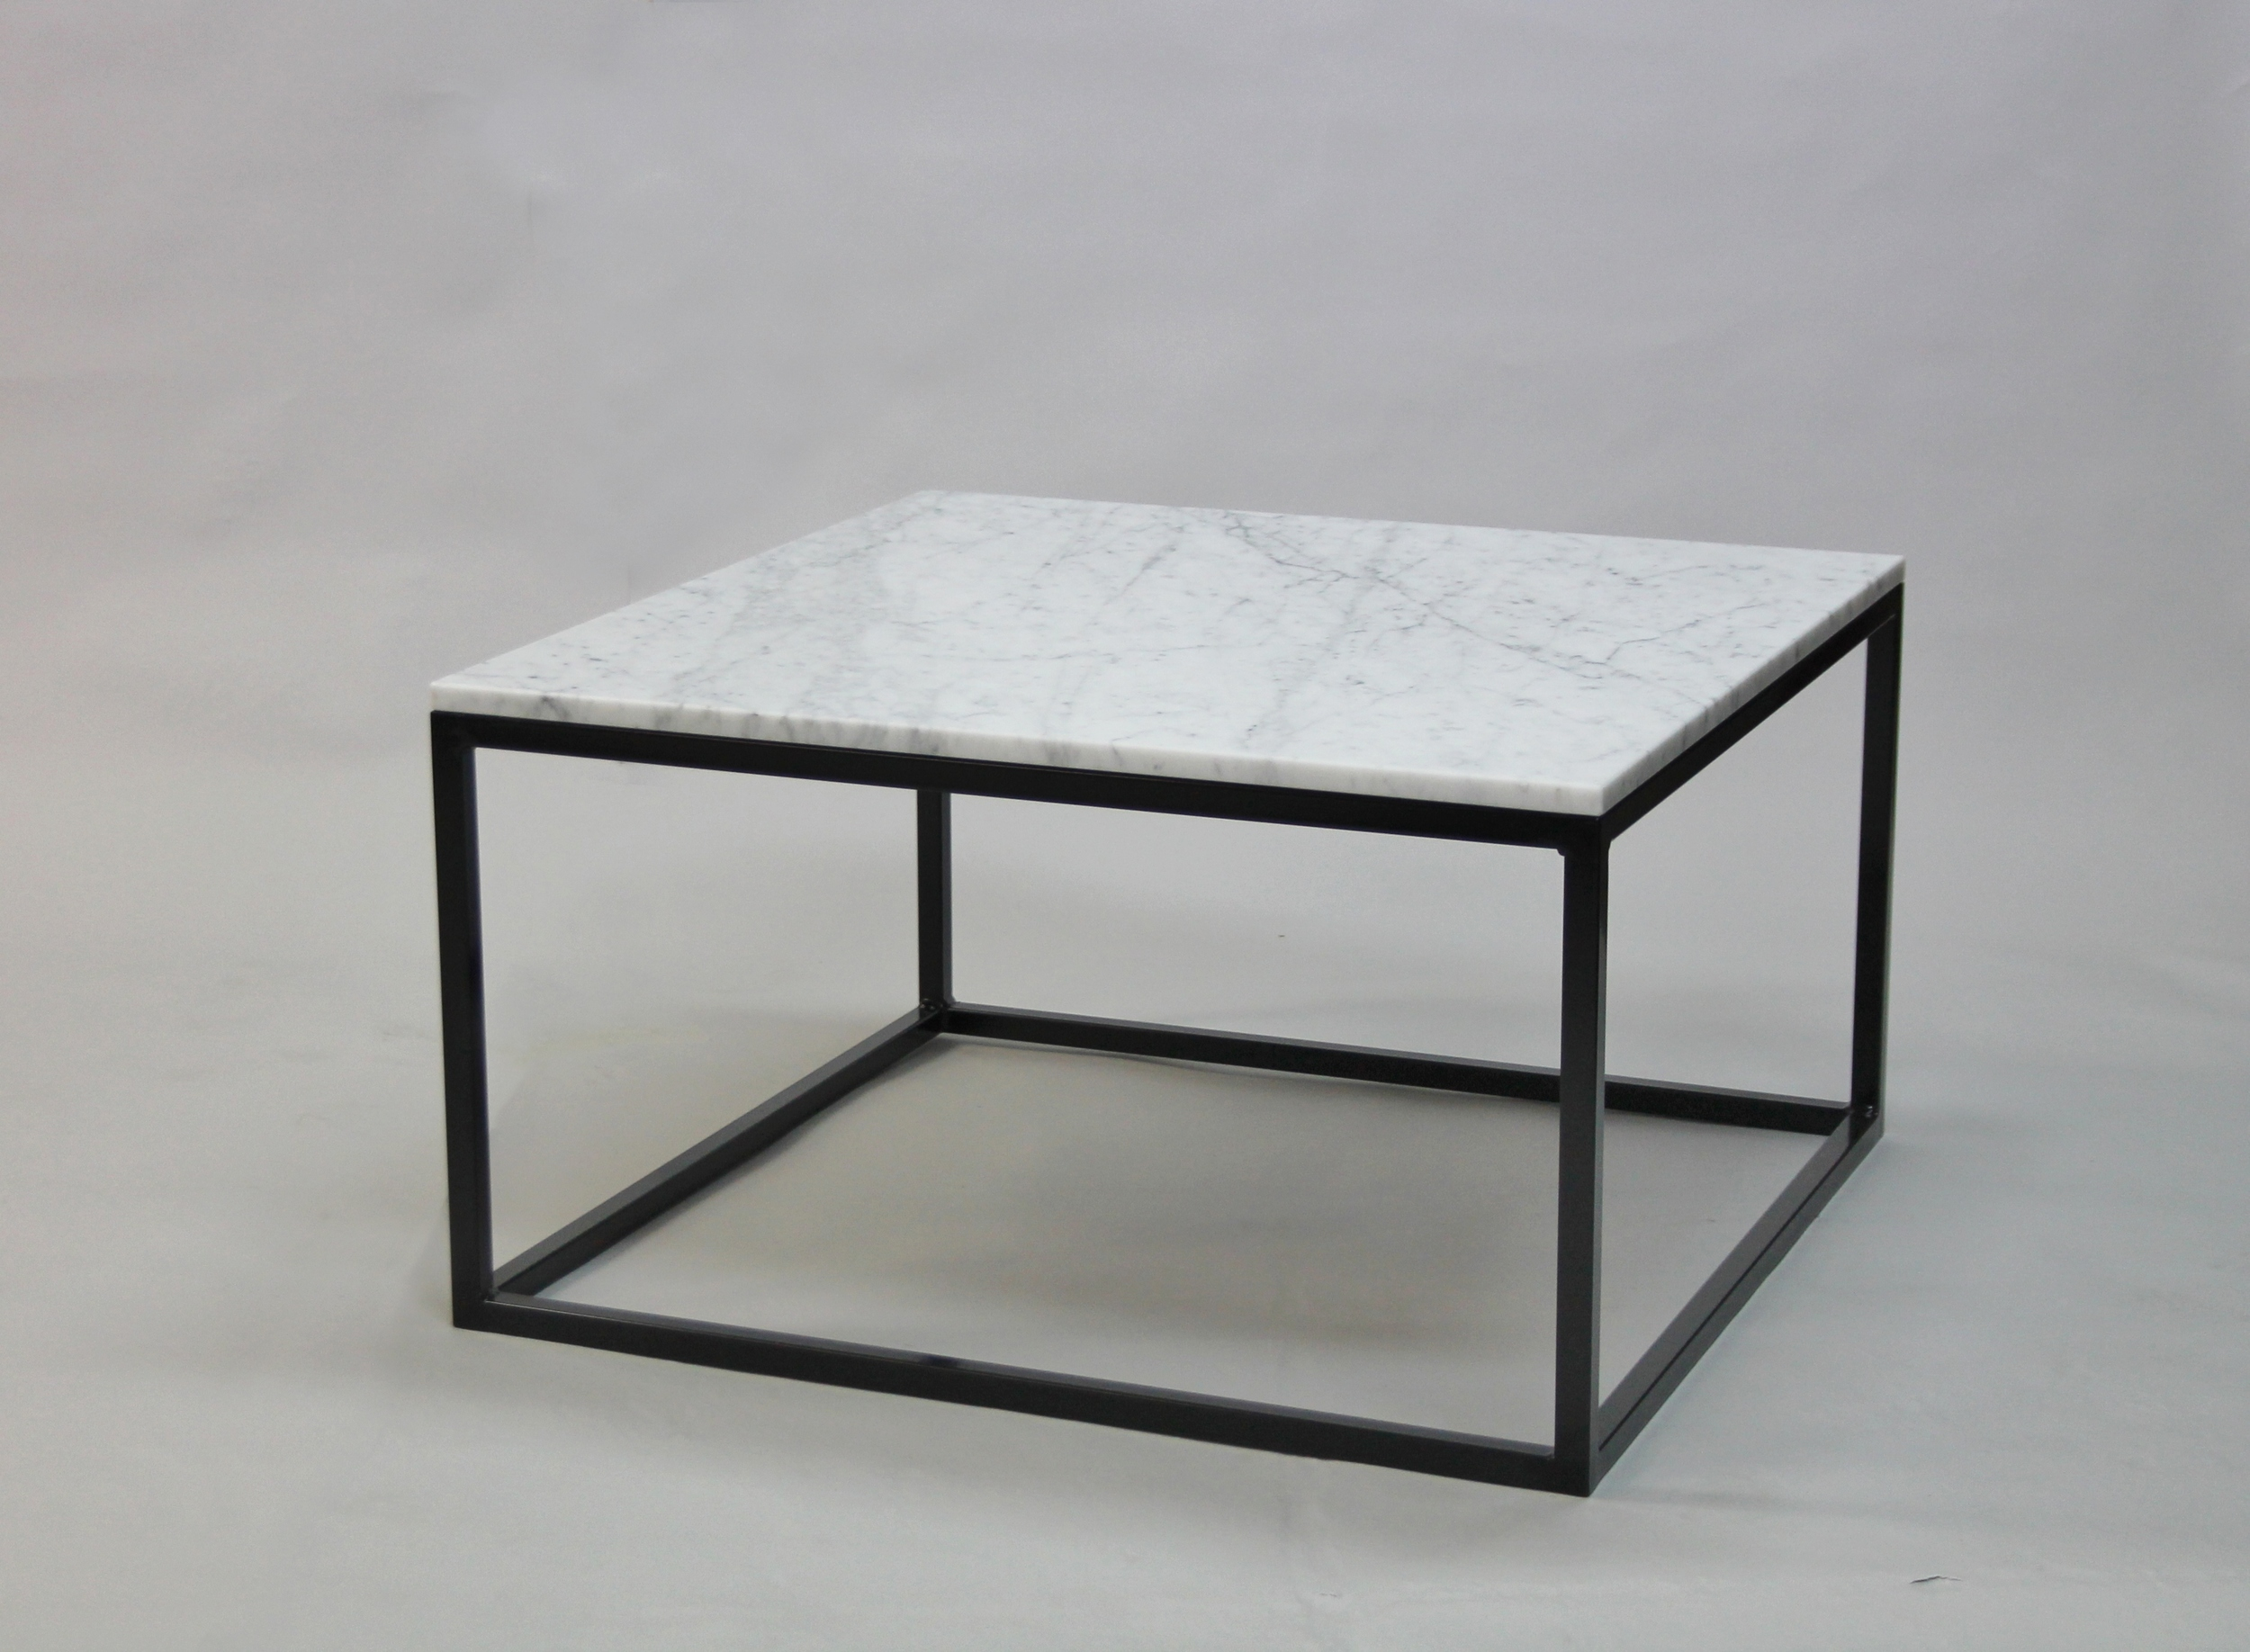 Marmorbord 80x80 H 45, svart kub underrede